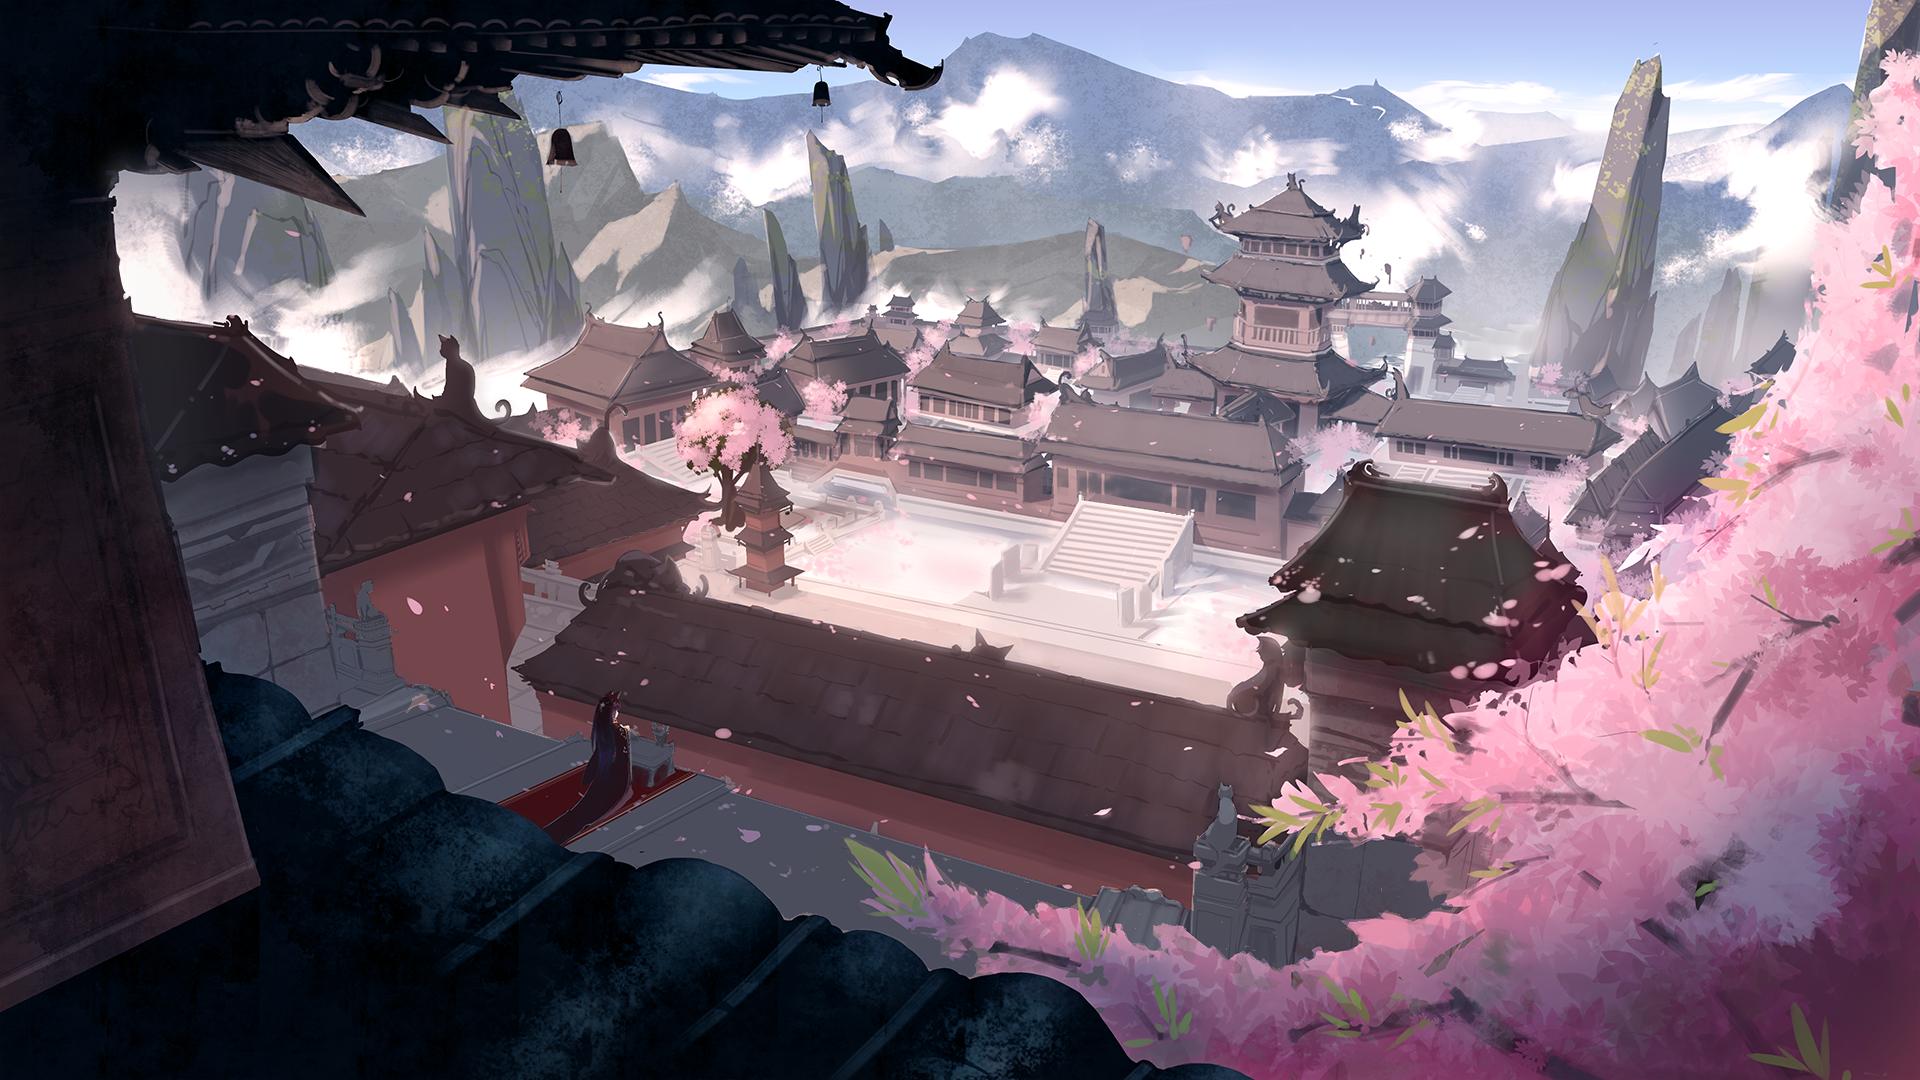 Anime 1920x1080 building flowers landscape fantasy art Asia anime futoshi ame